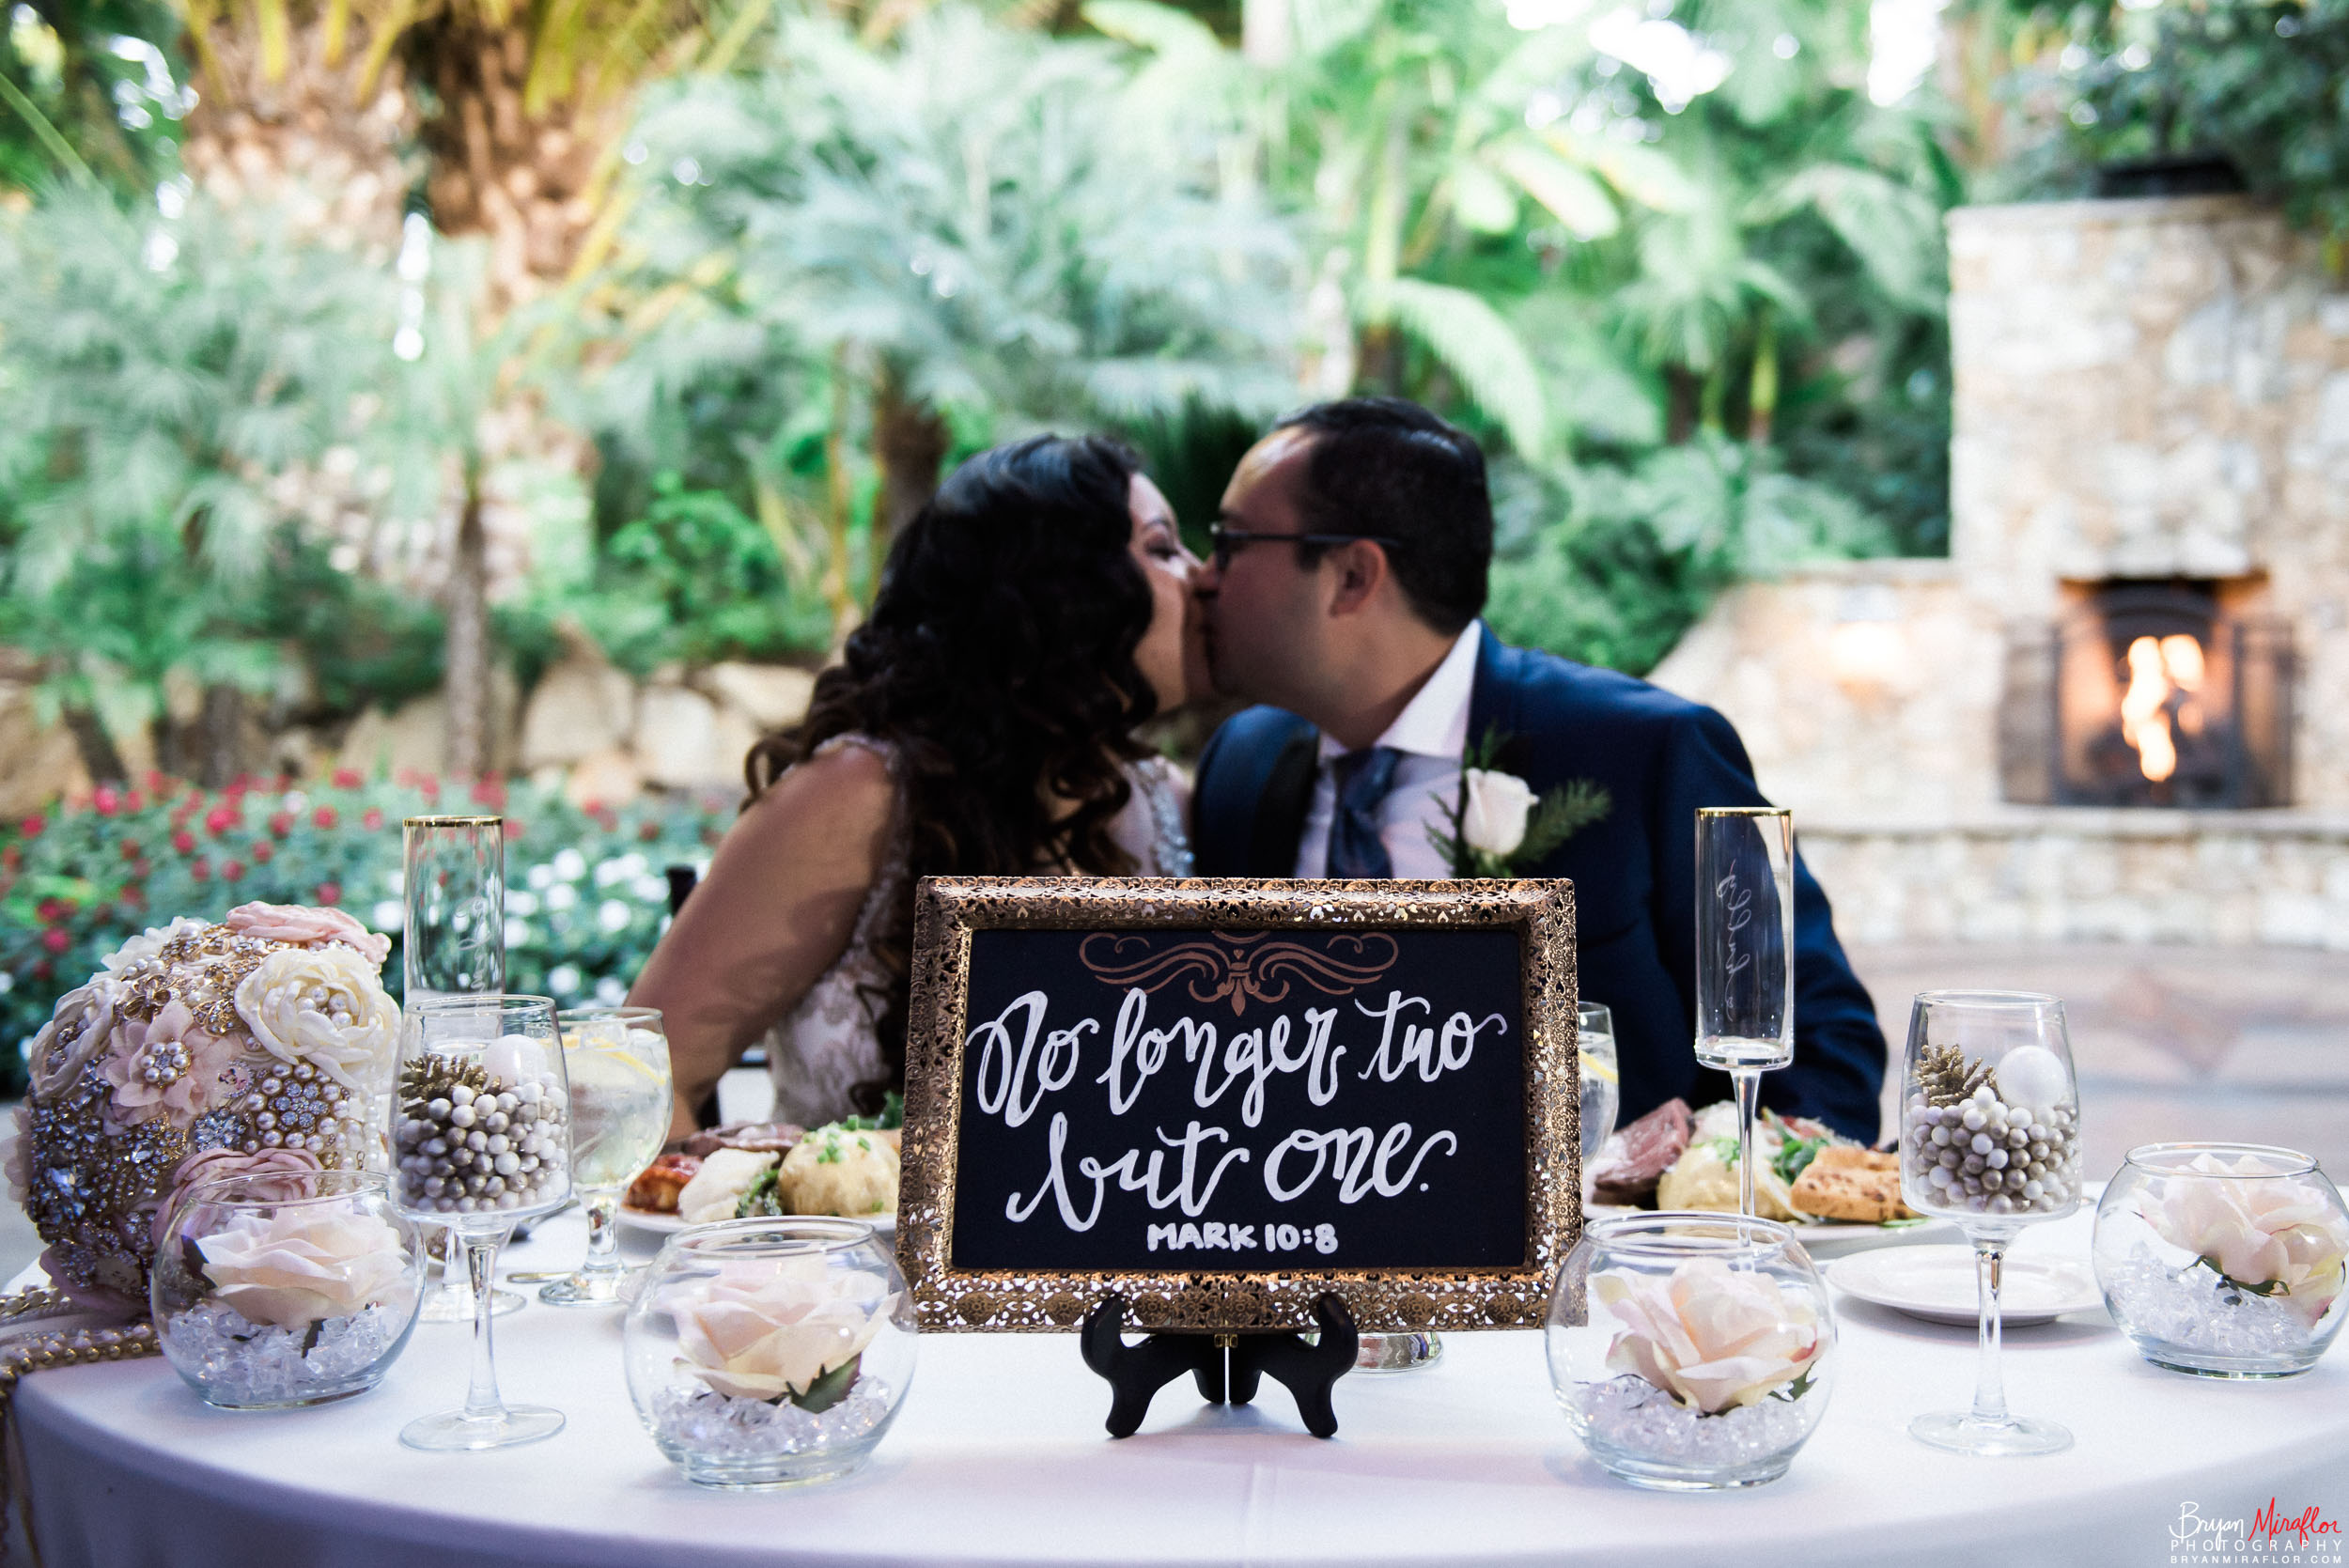 Bryan-Miraflor-Photography-Hannah-Jonathan-Married-Grand-Traditions-Estate-Gardens-Fallbrook-20171222-185.jpg